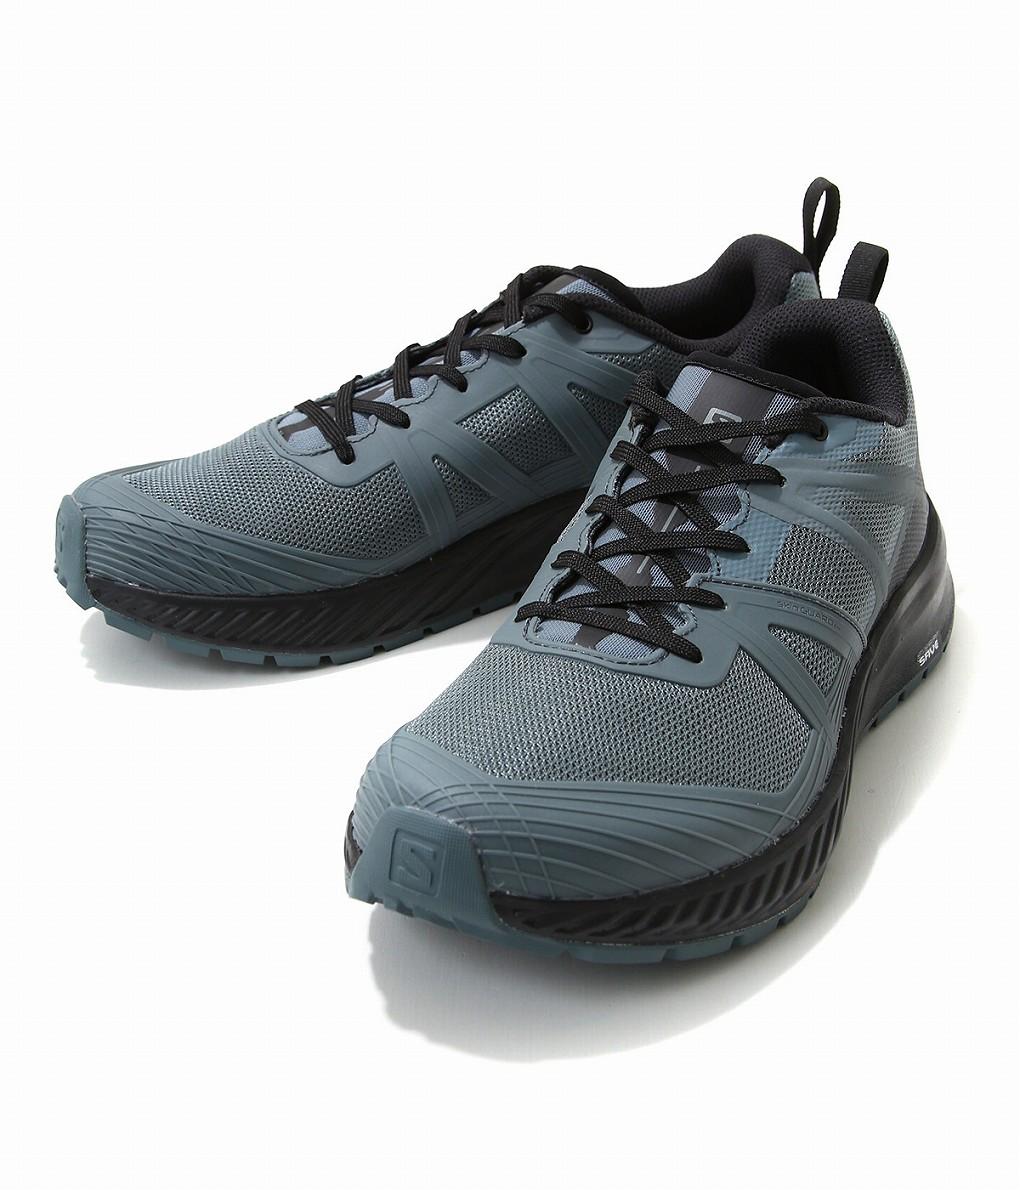 SALOMON / サロモン : ODYSSEY TRIPLE CROWN :サロモン オデッセイ トリプル クラウン カラフル スニーカー 靴 シューズ : L40685700 【AST】